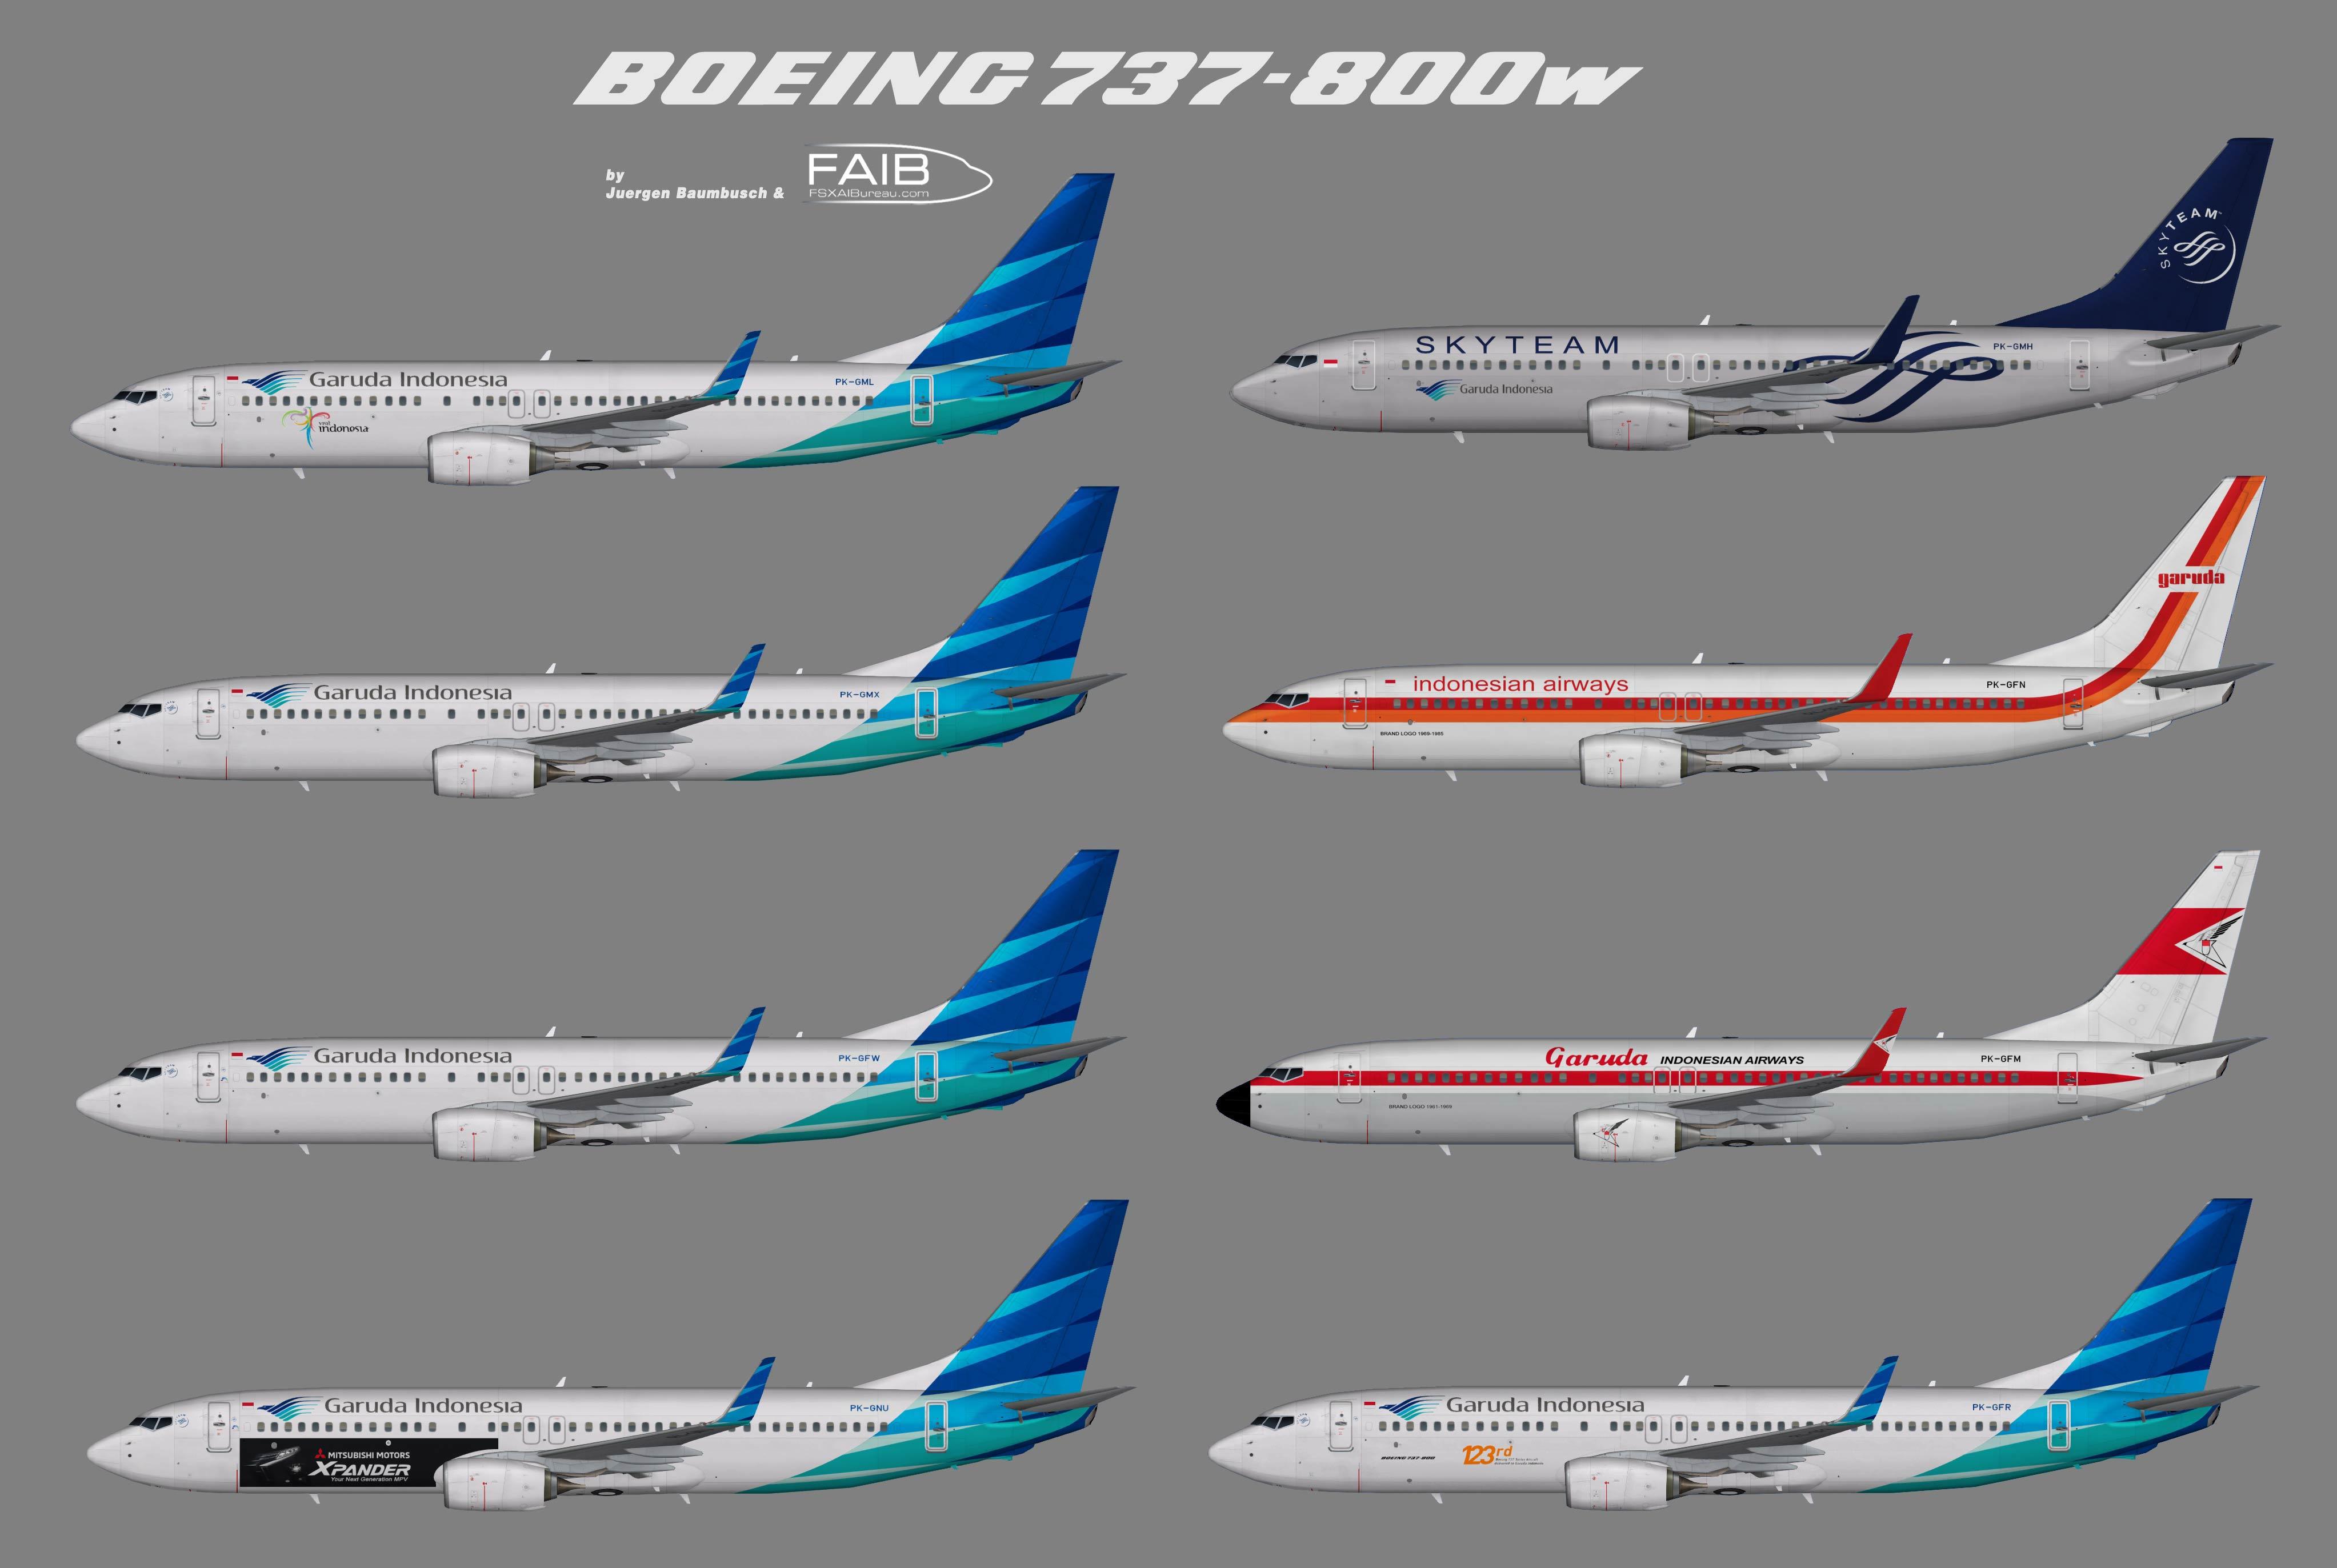 Garuda Indonesia Boeing 737-800w